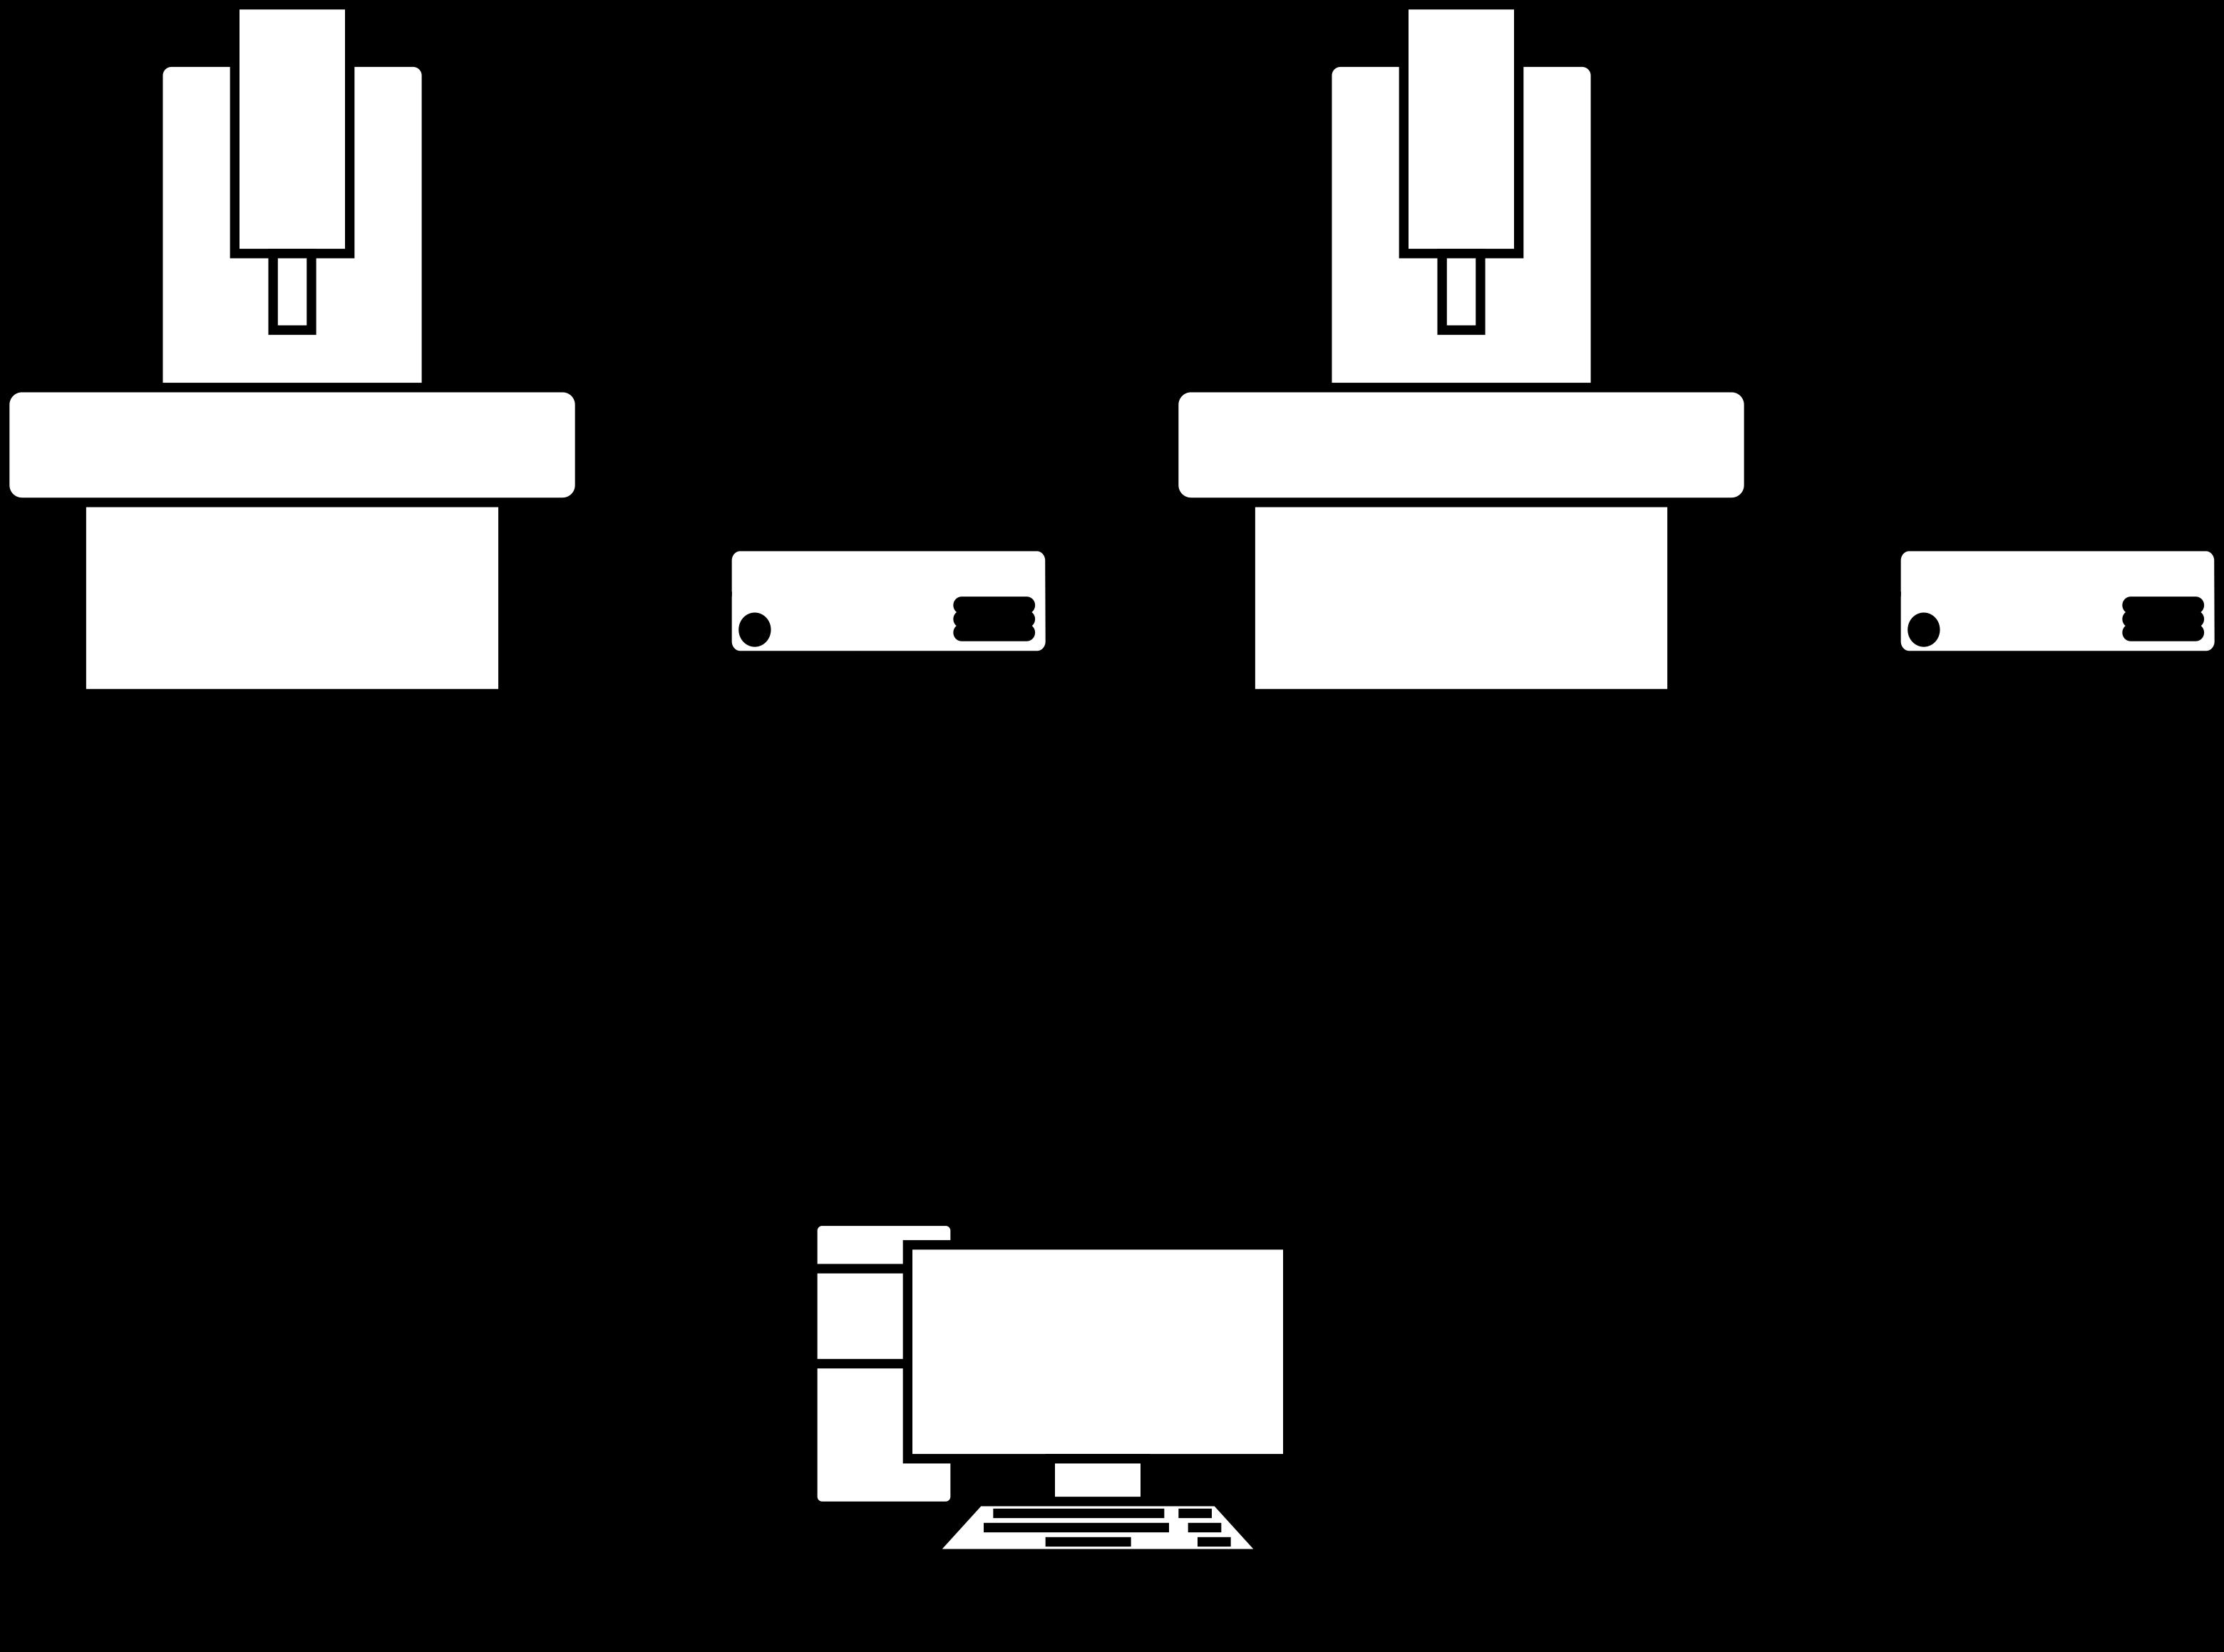 machinetalk explained - part 1  introduction